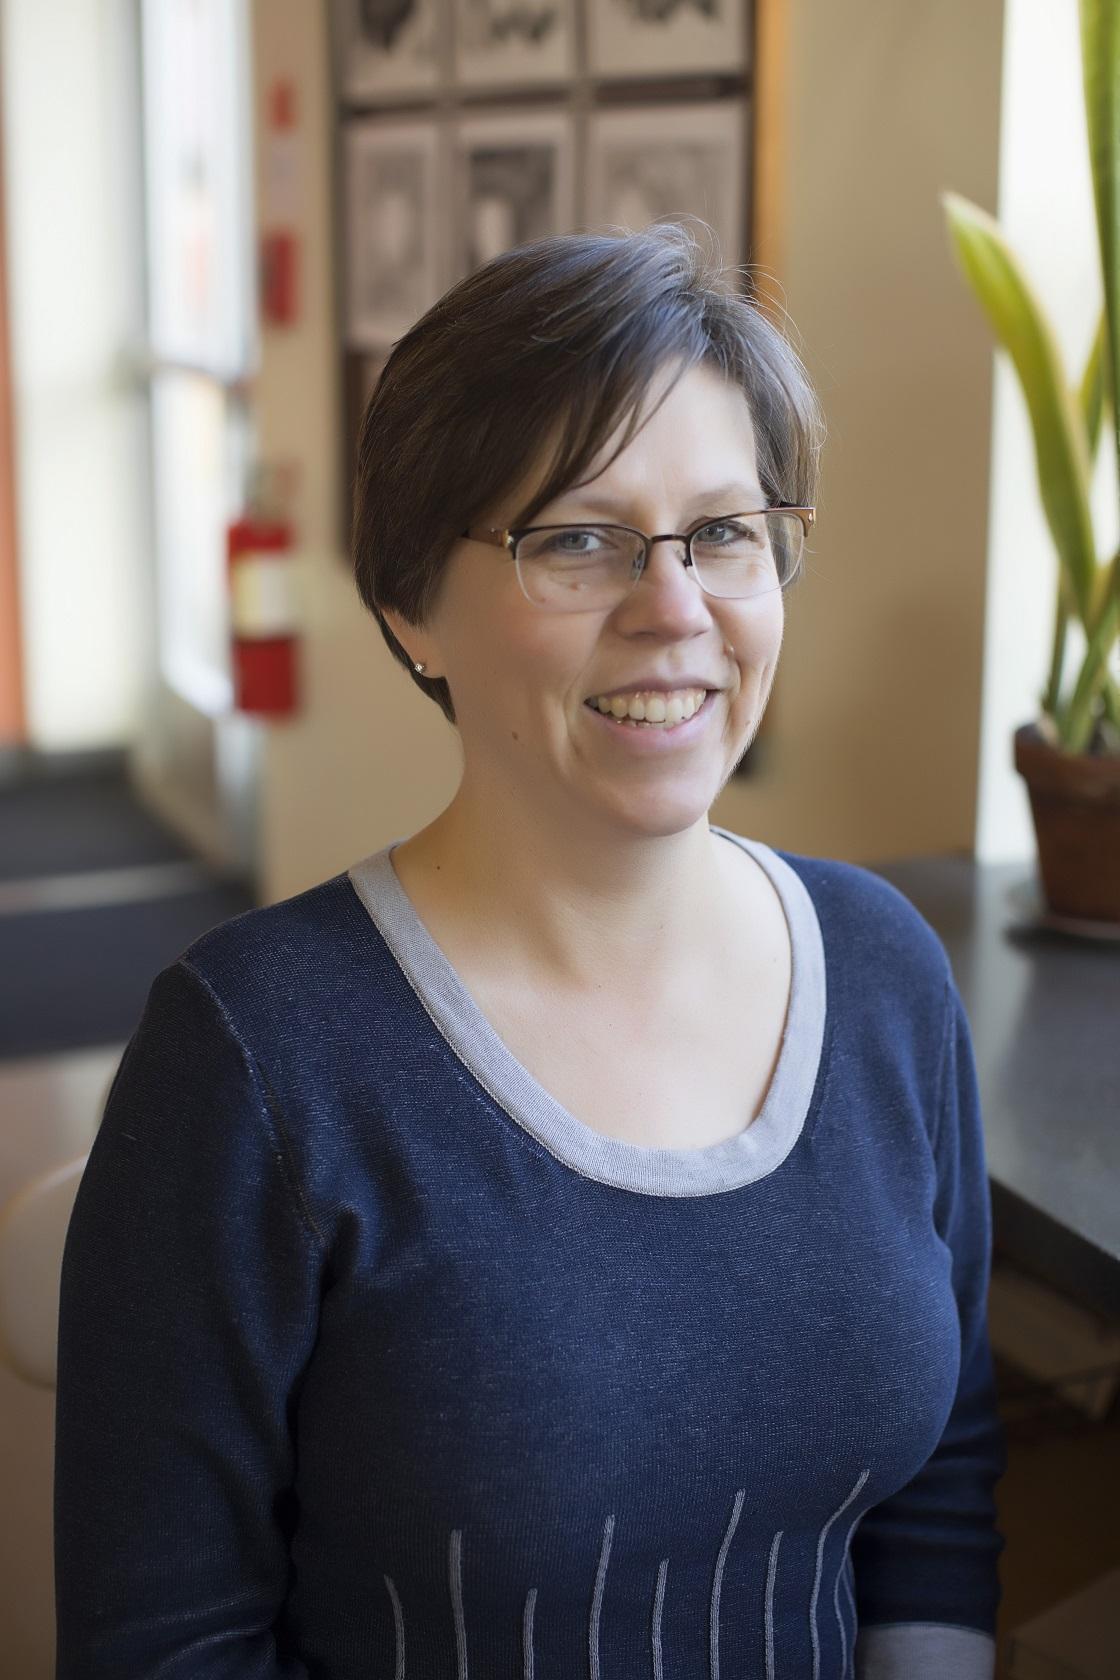 Janine Huber